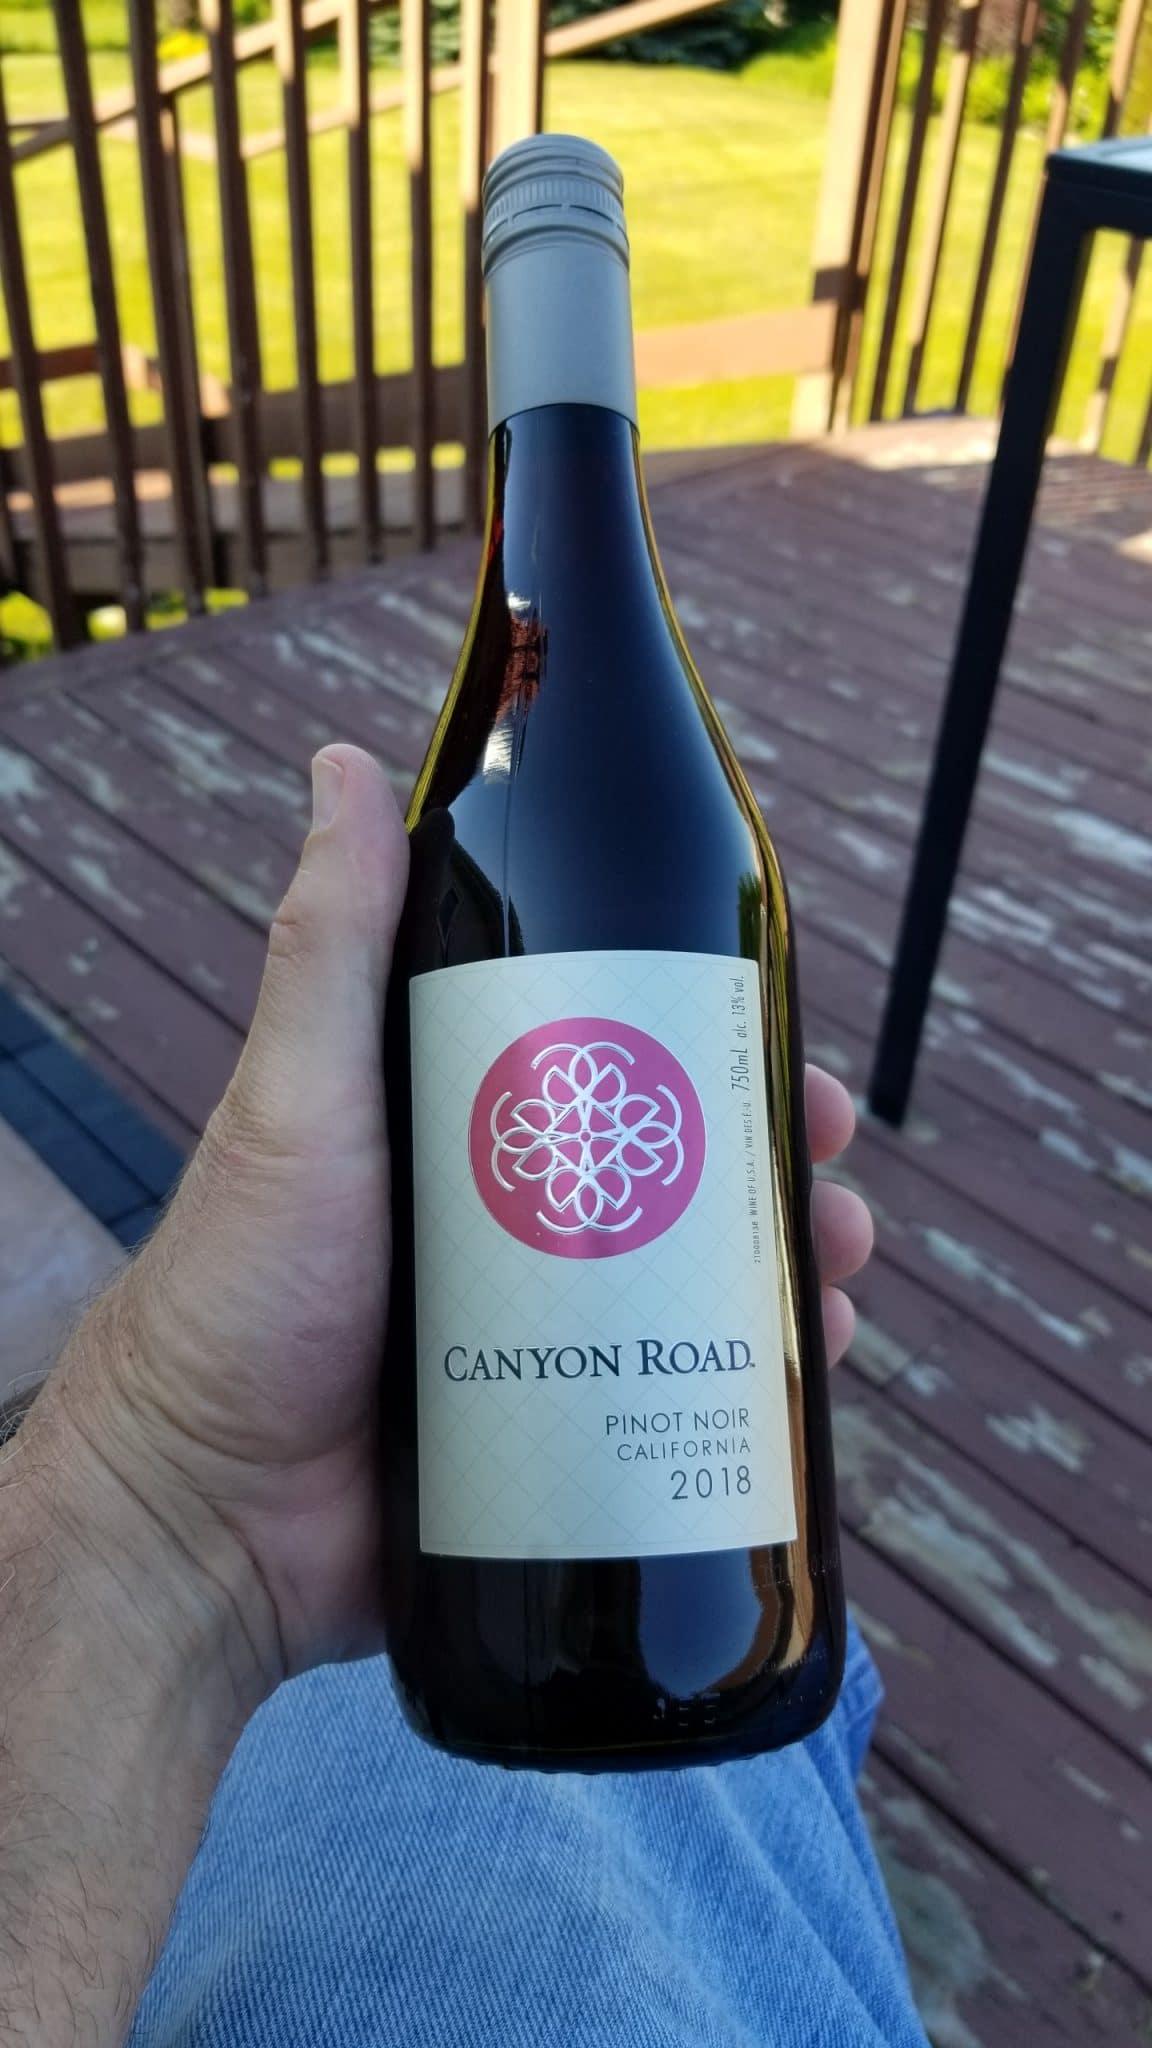 $9.95 - Canyon Road Pinot Noir 2018